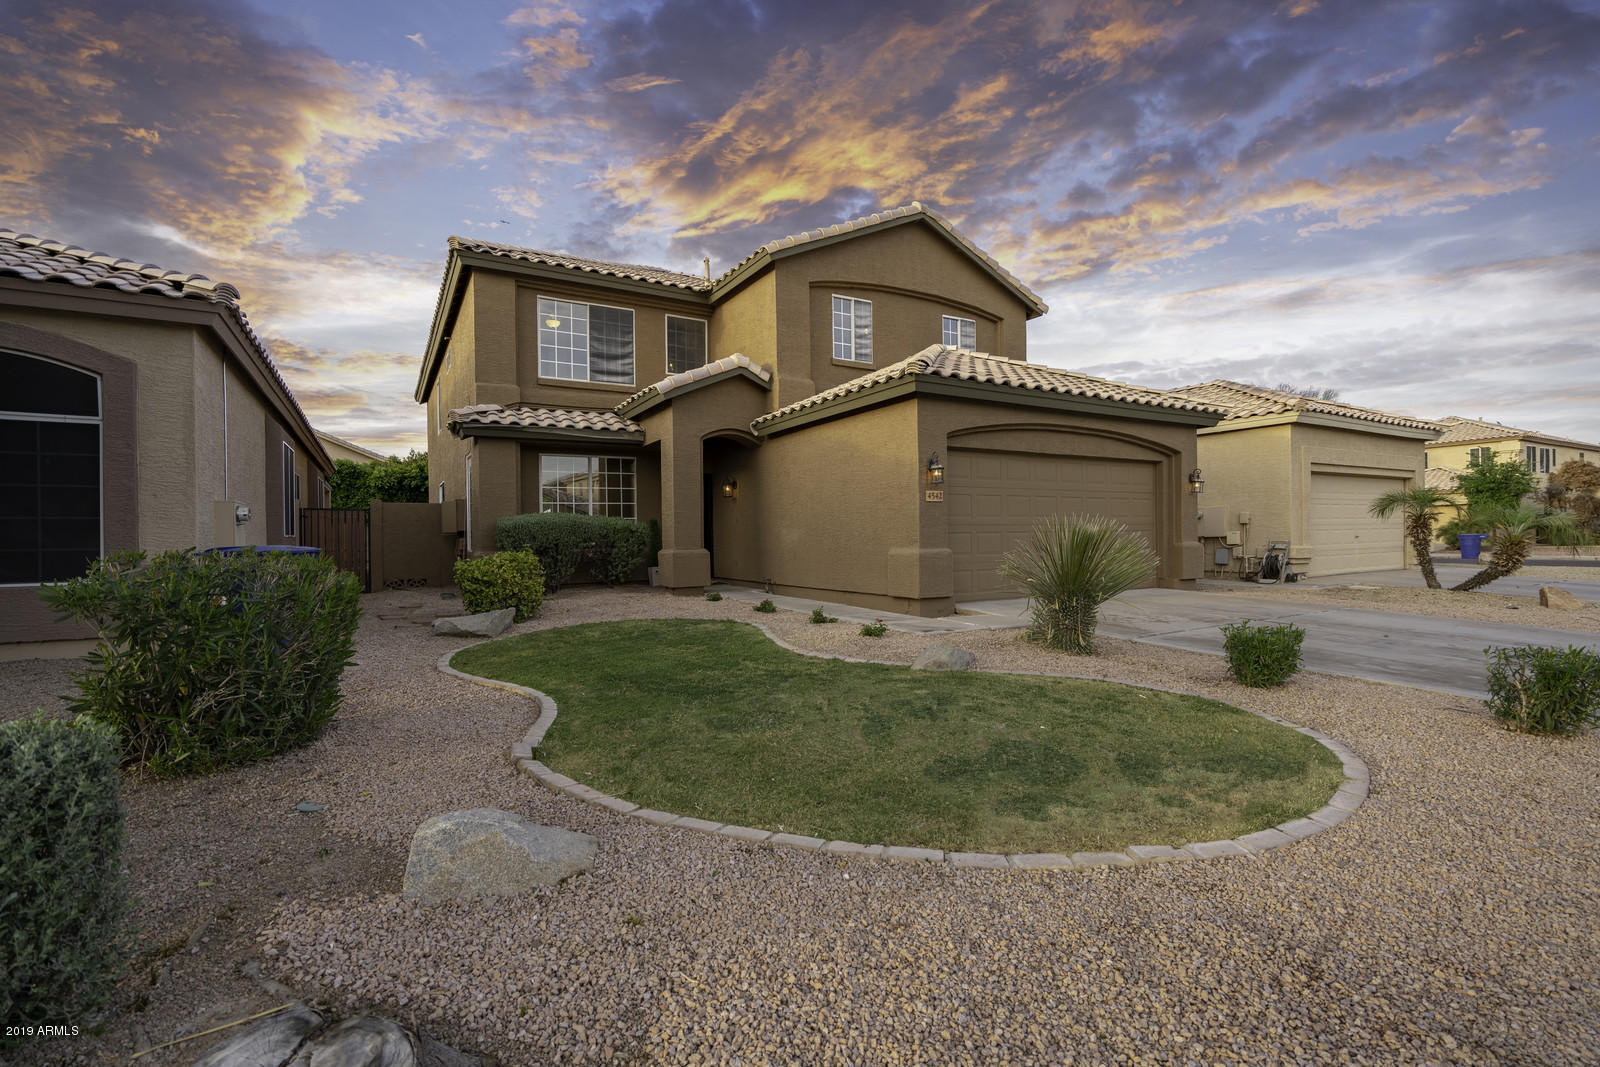 Photo of 4542 W TOLEDO Street, Chandler, AZ 85226